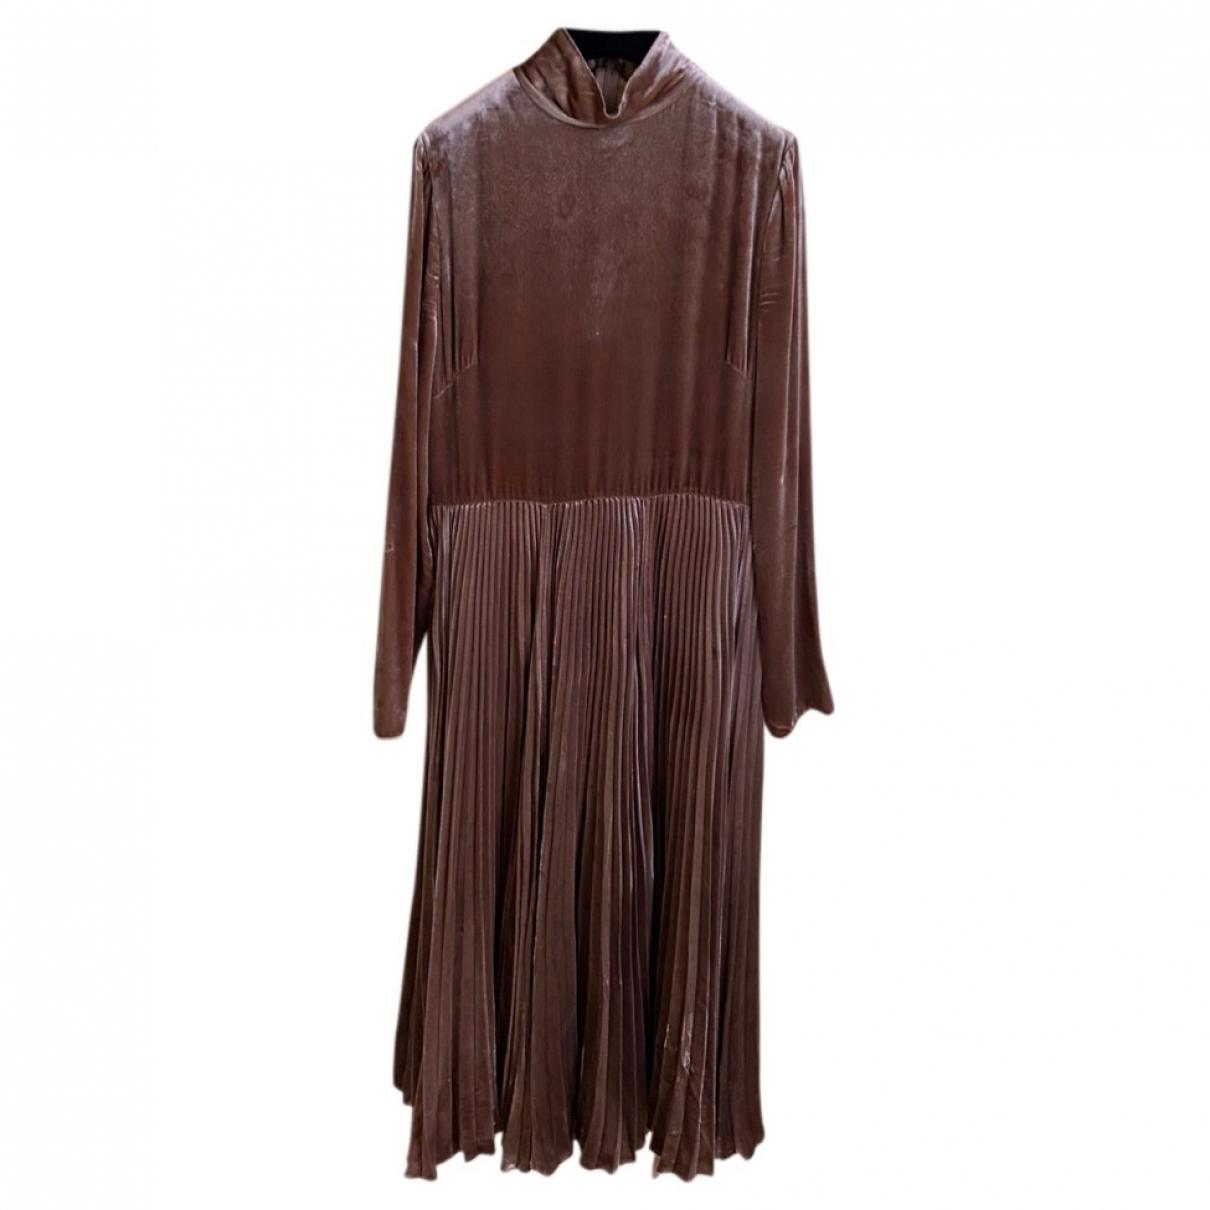 Valentino Garavani \N Camel dress for Women 44 IT